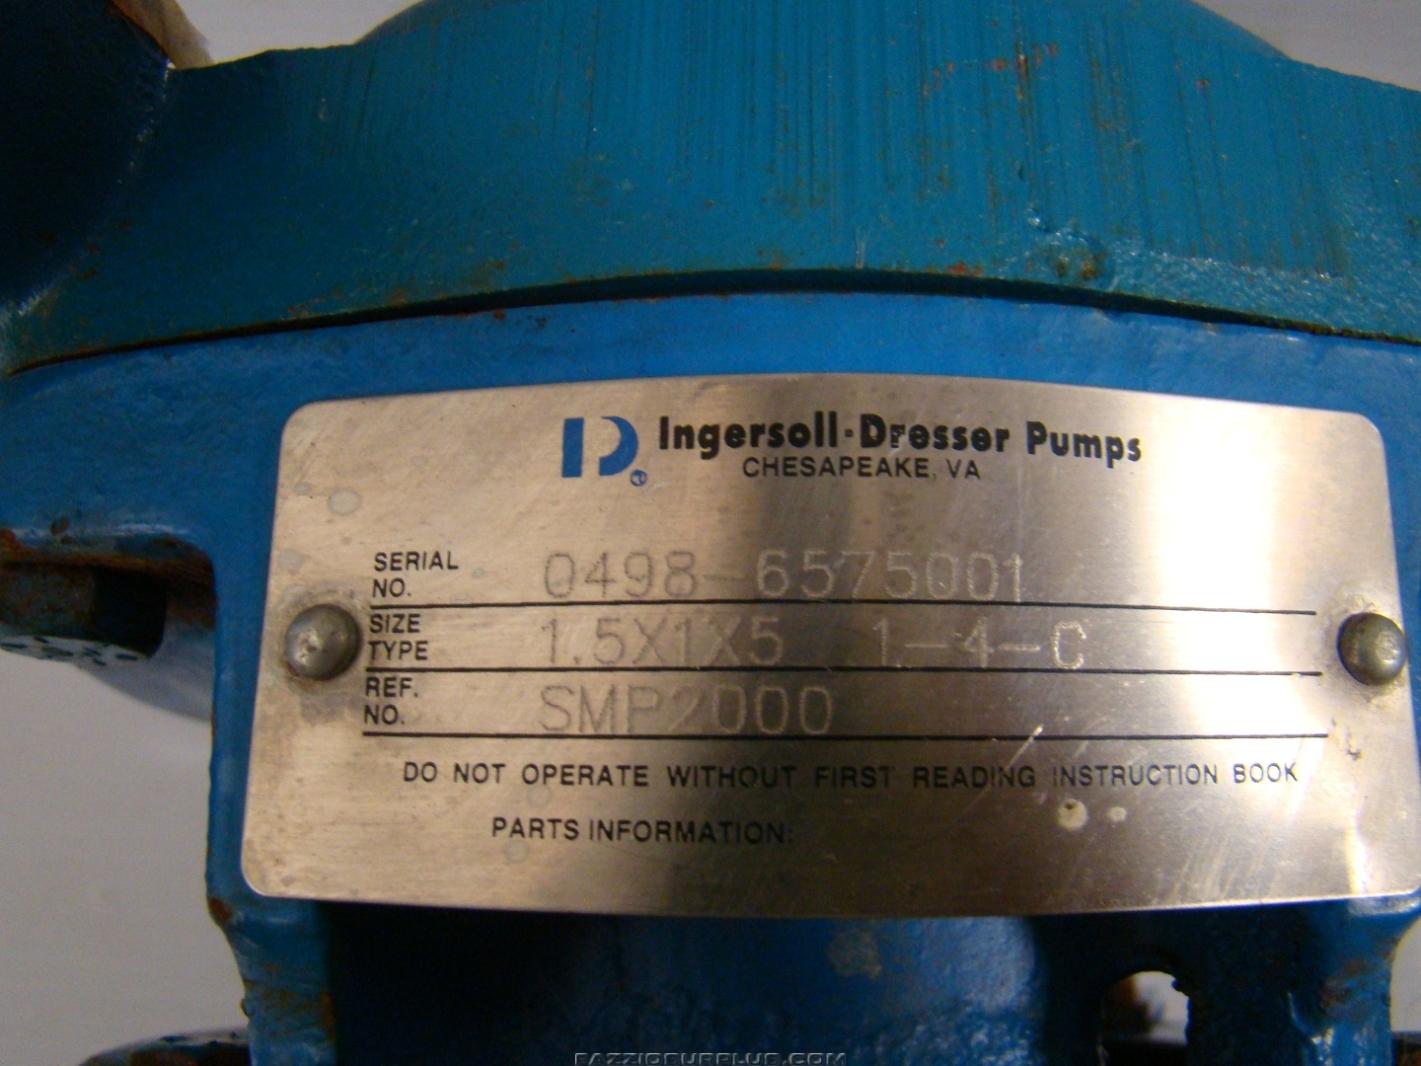 Ingersoll Dresser Pumps 1hp 230 460v 3ph